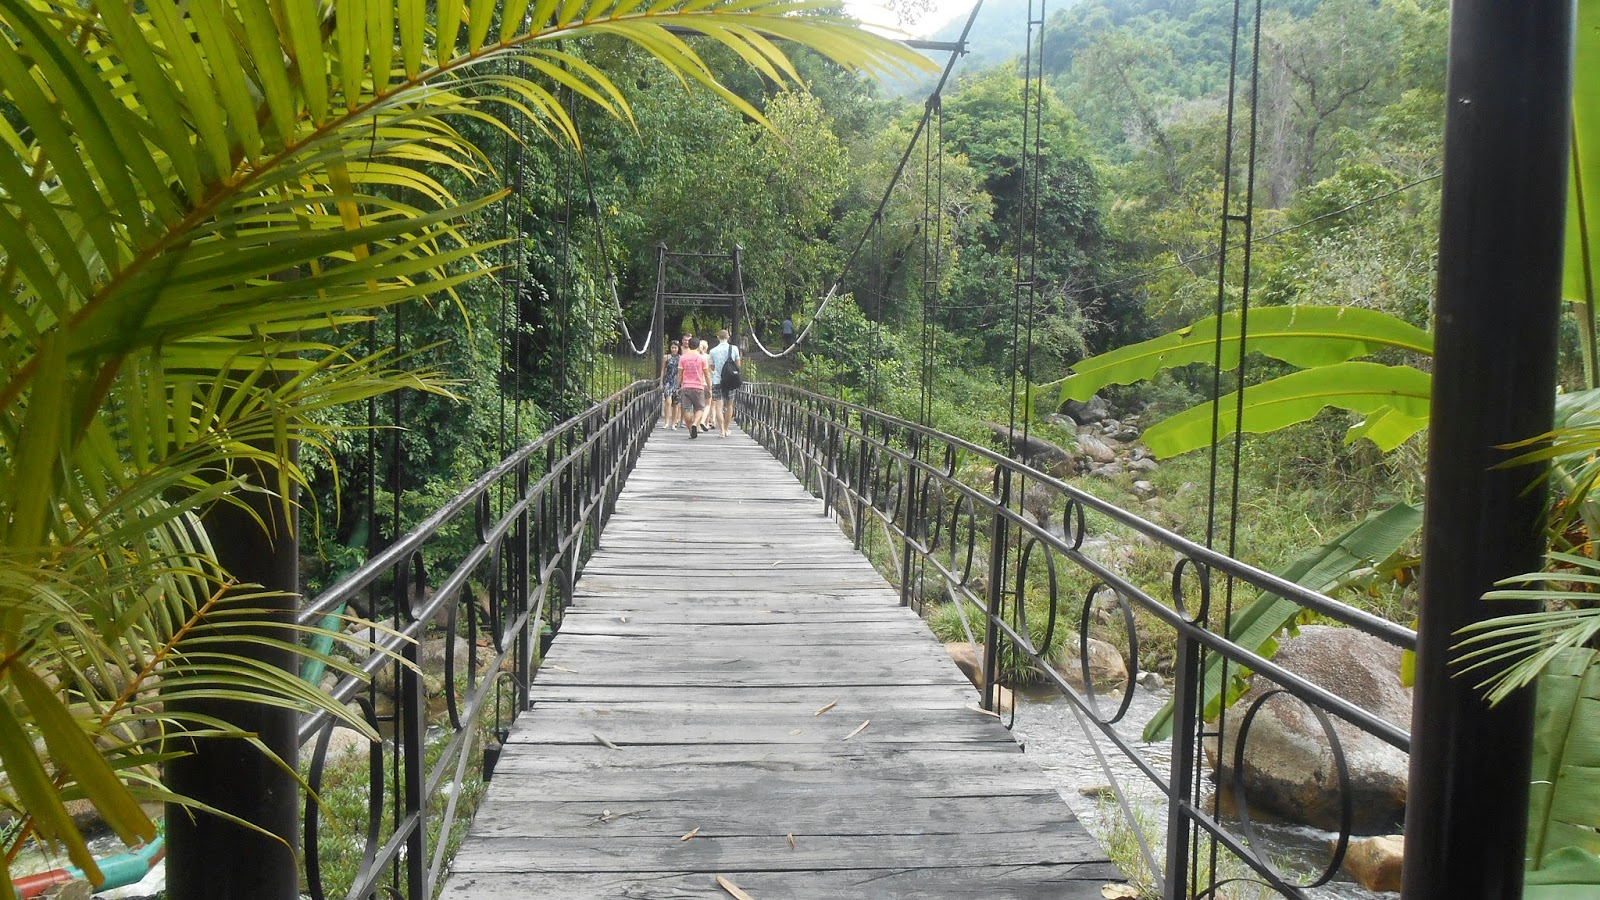 мостик через речку